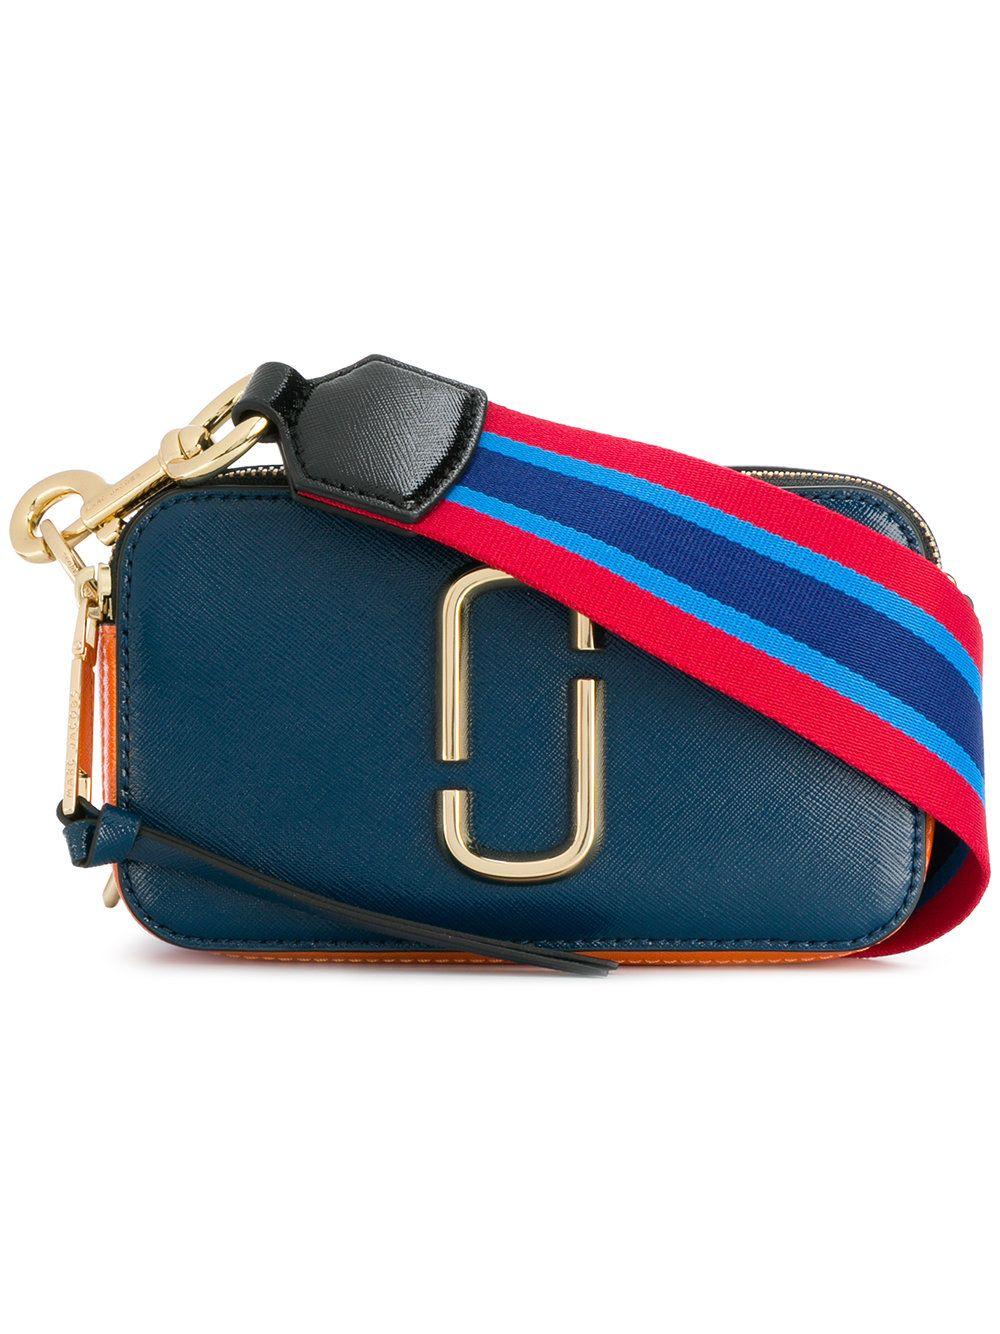 887b98e4f9bb Marc Jacobs small Snapshot camera bag